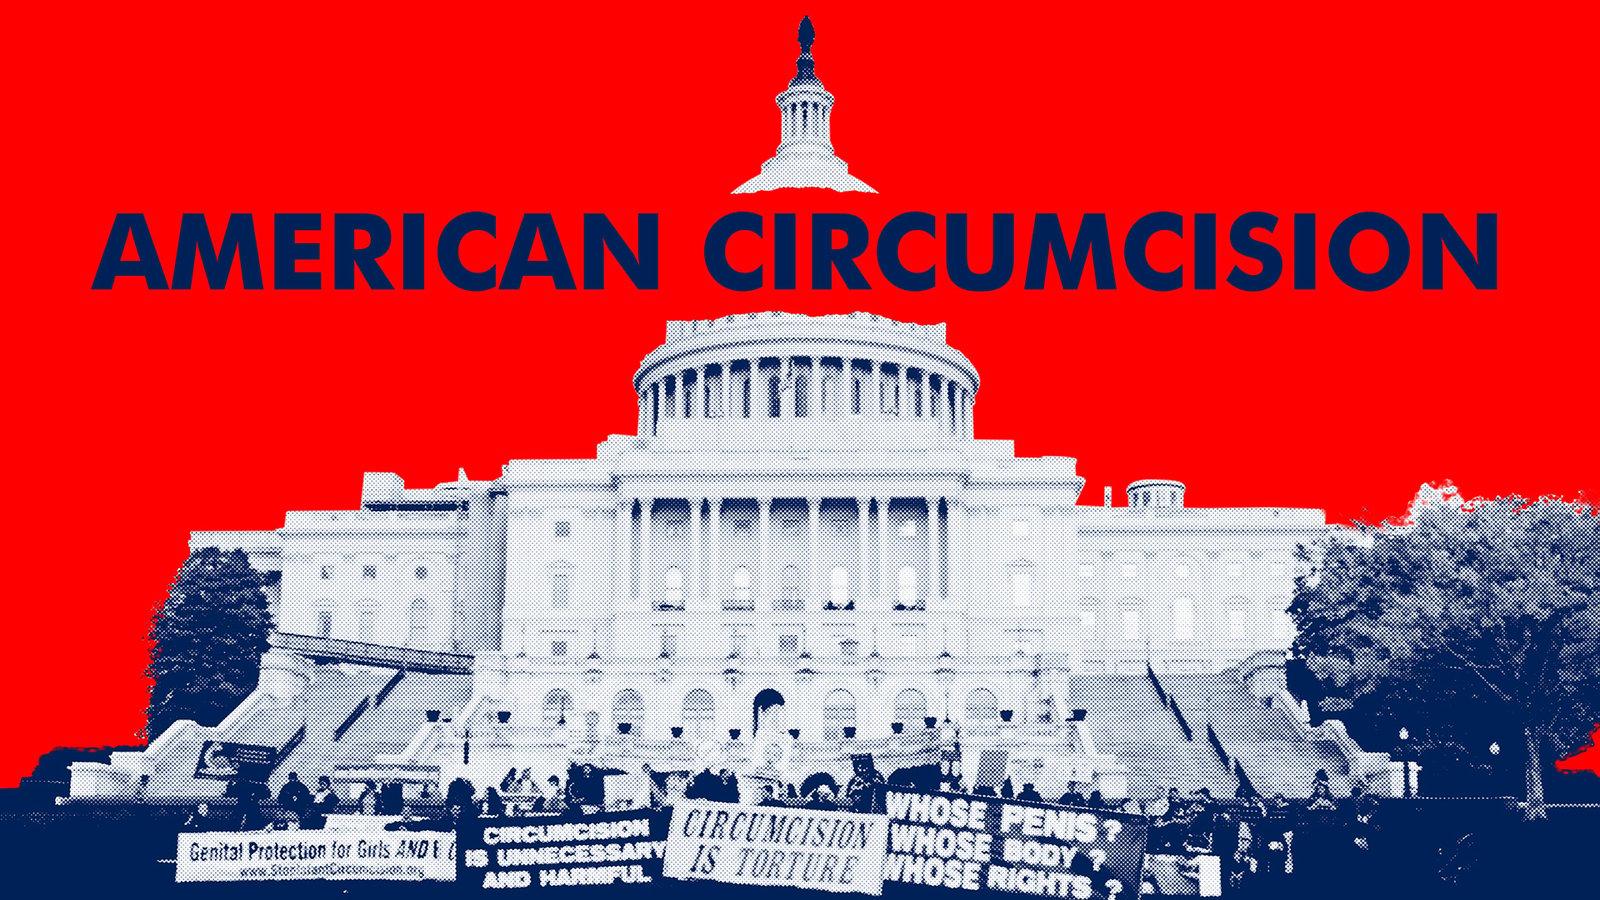 American Circumcision - The Intactivist Movement and the Circumcision Debate